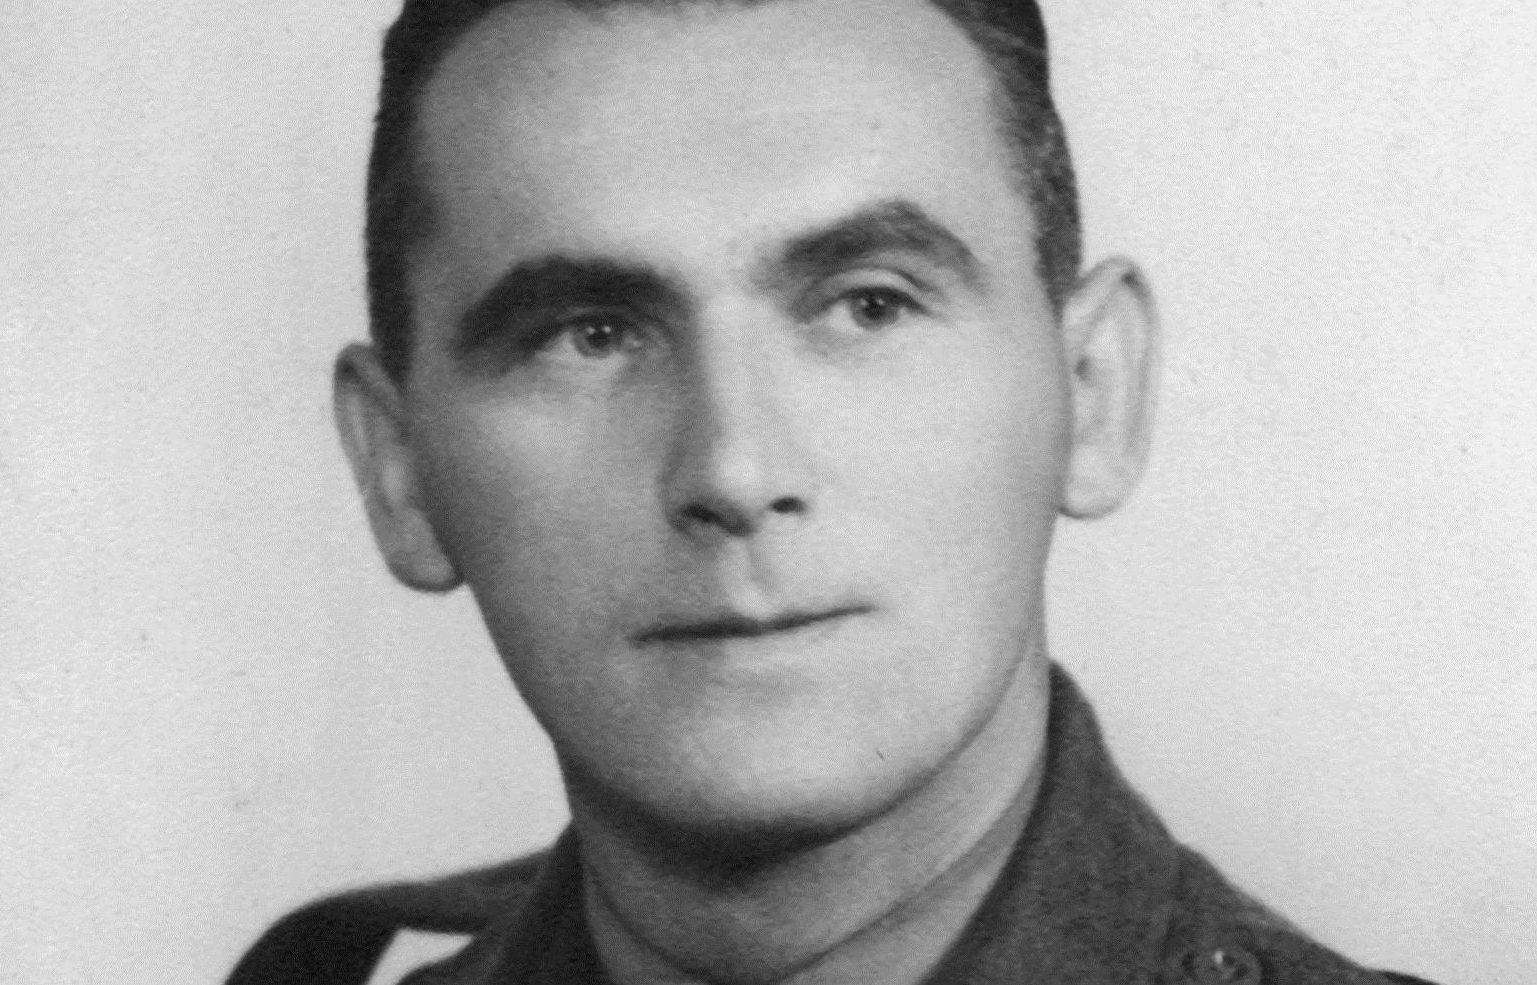 Tom Guttridge was captured during the Dunkirk evacuation in 1940